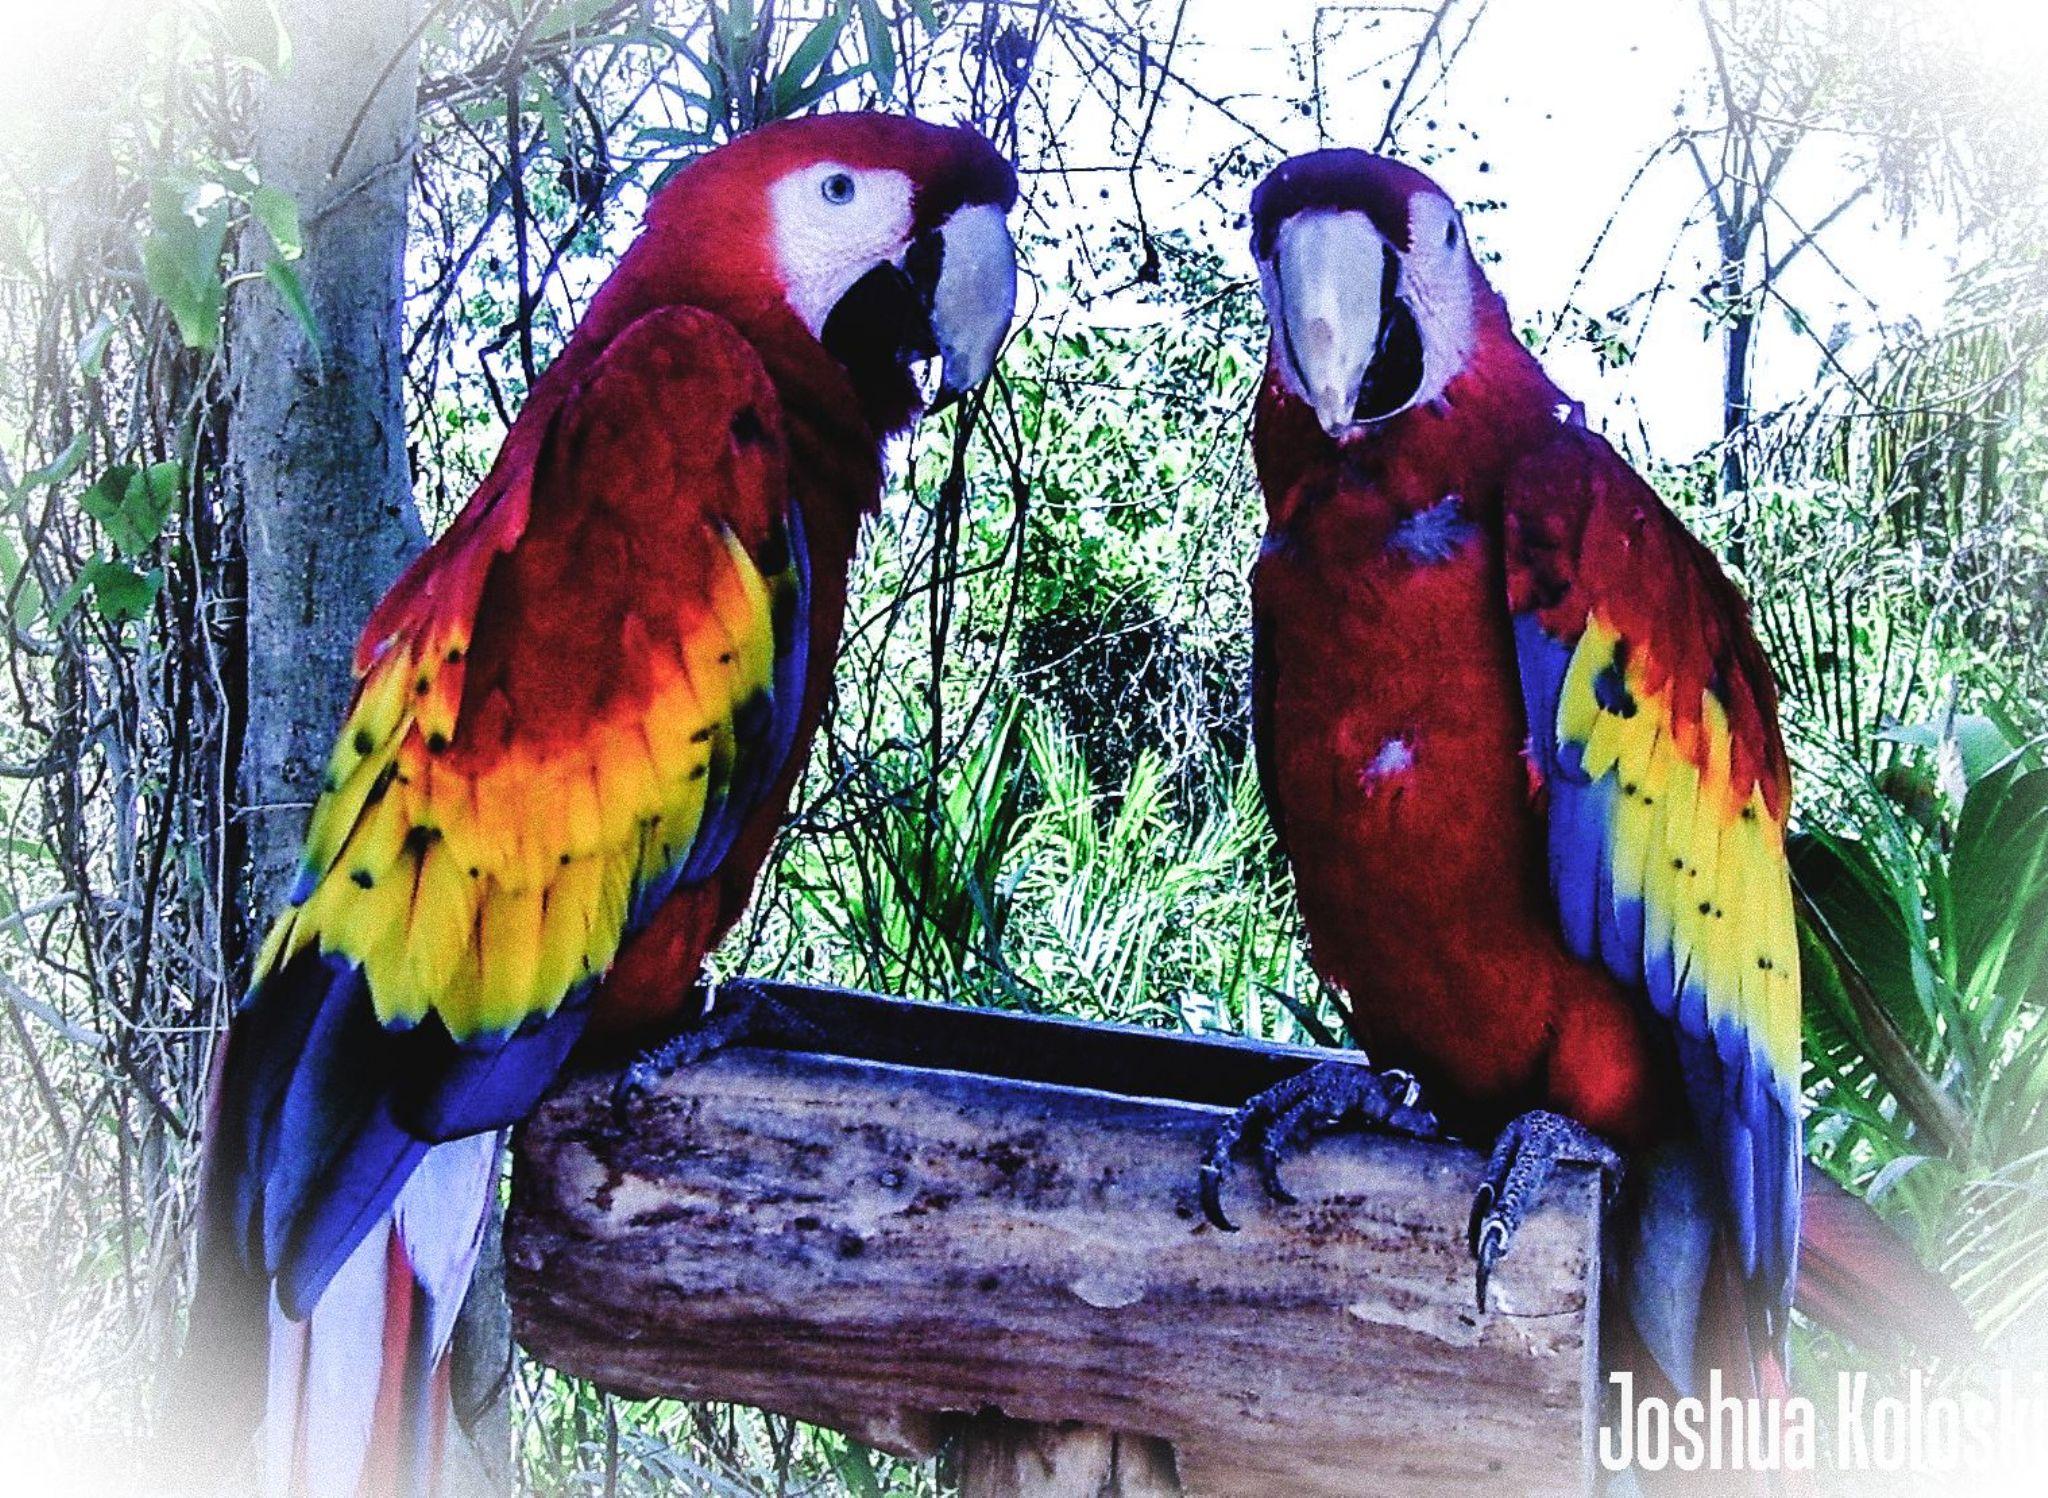 Birds by Joshua Koloski